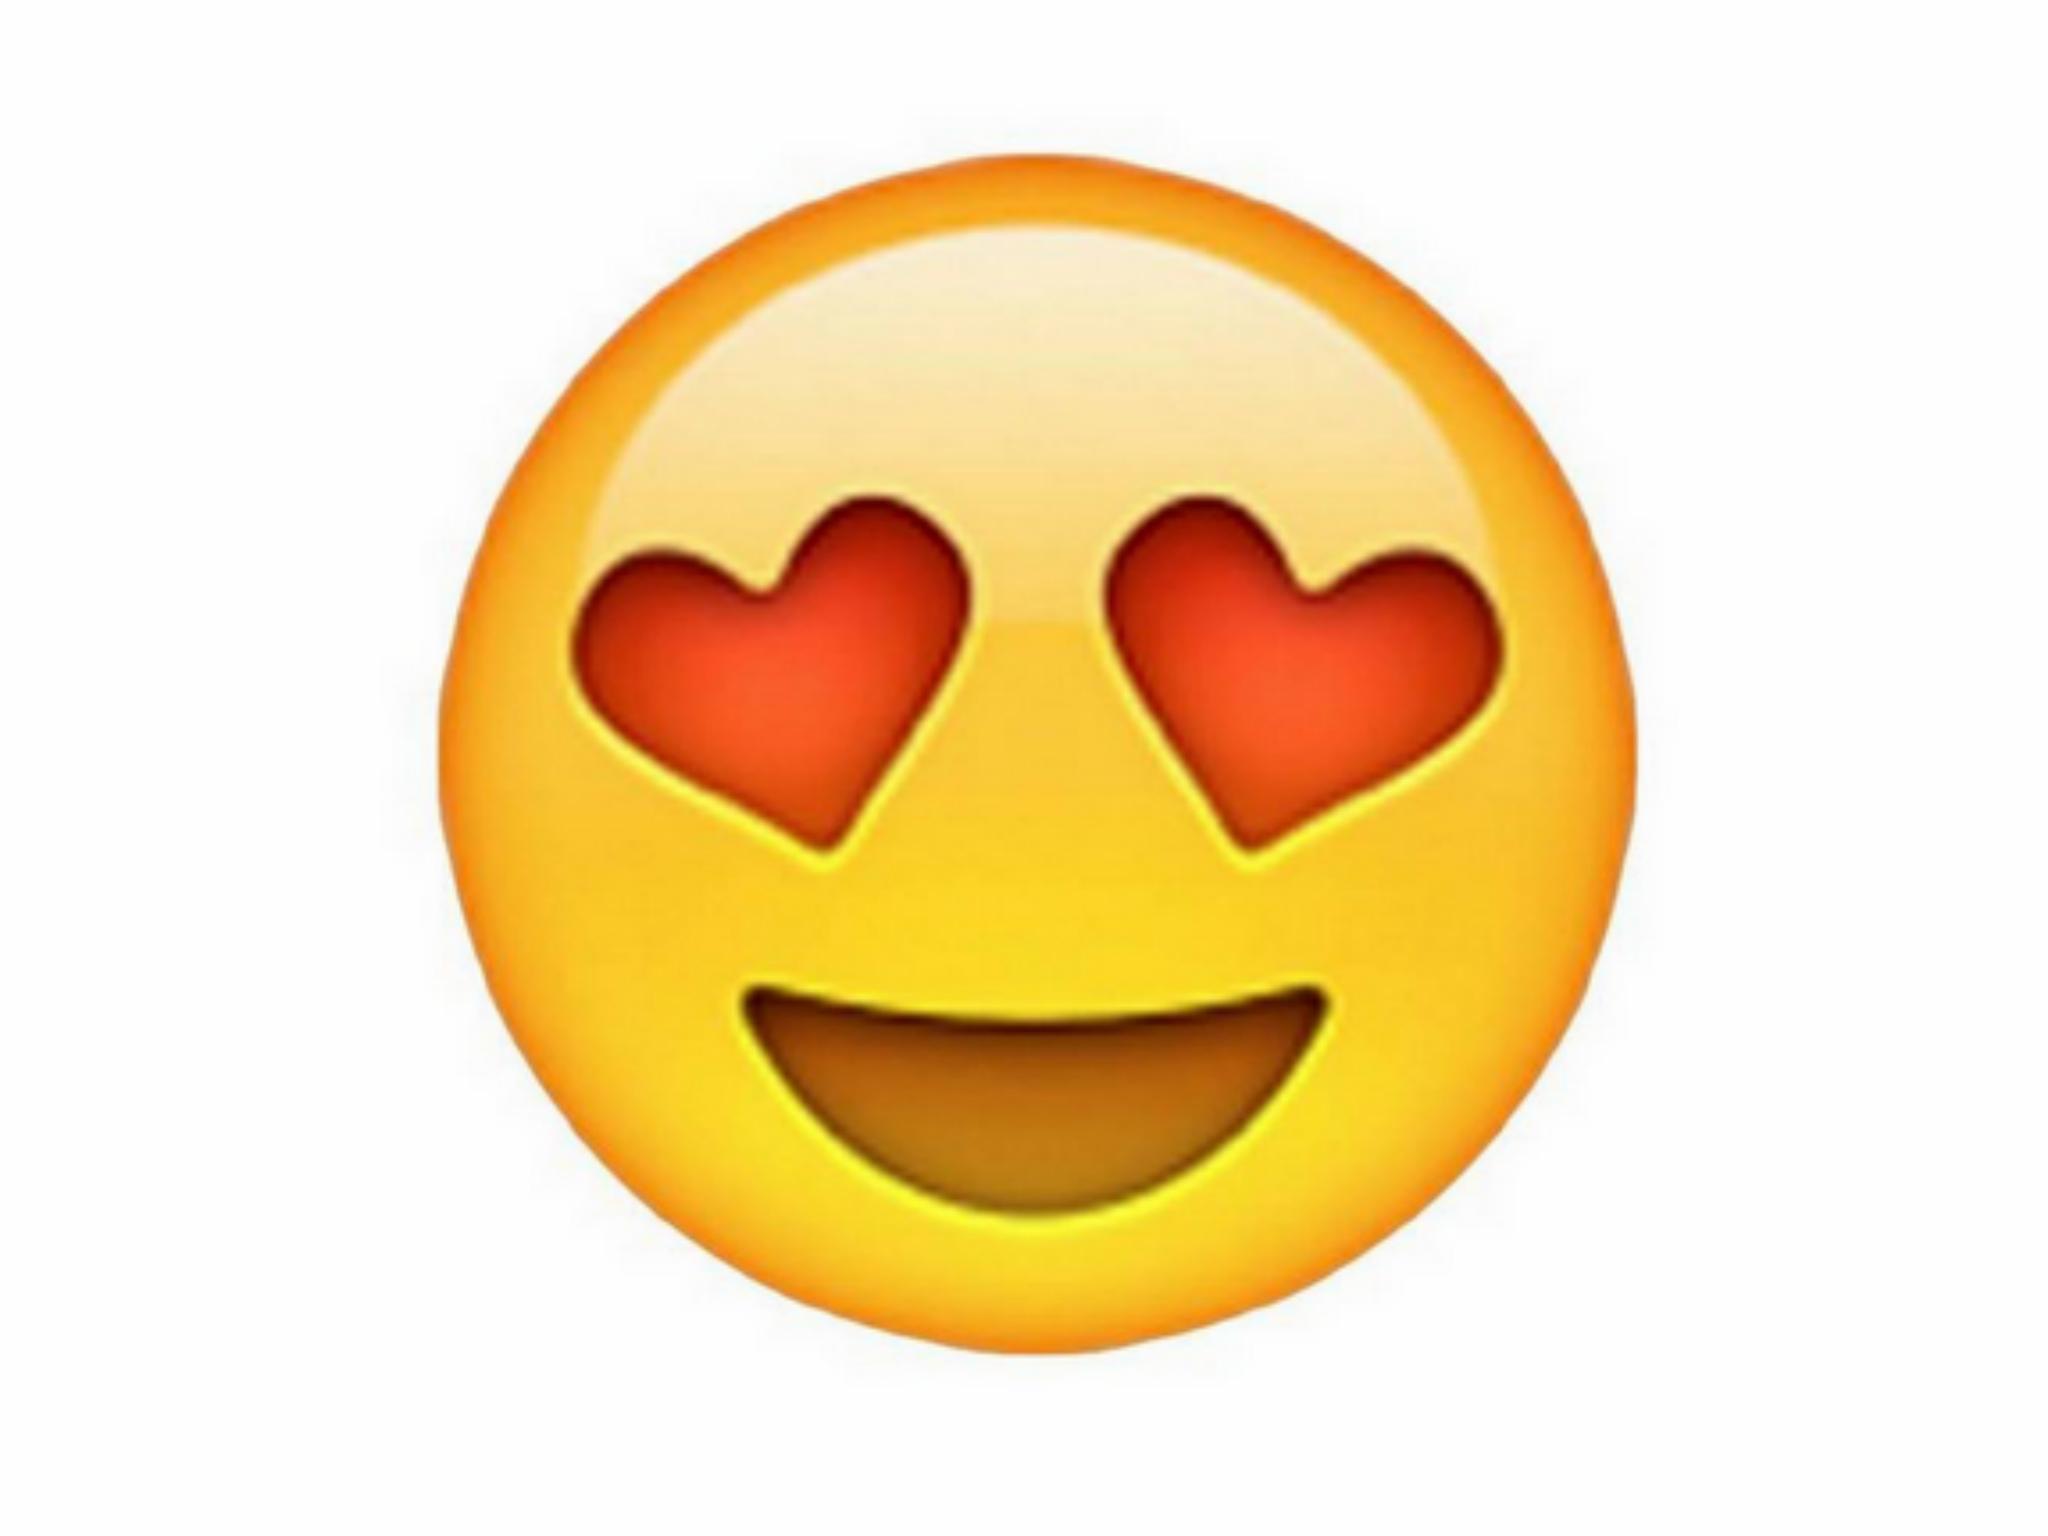 single heart emojis likewise - photo #19